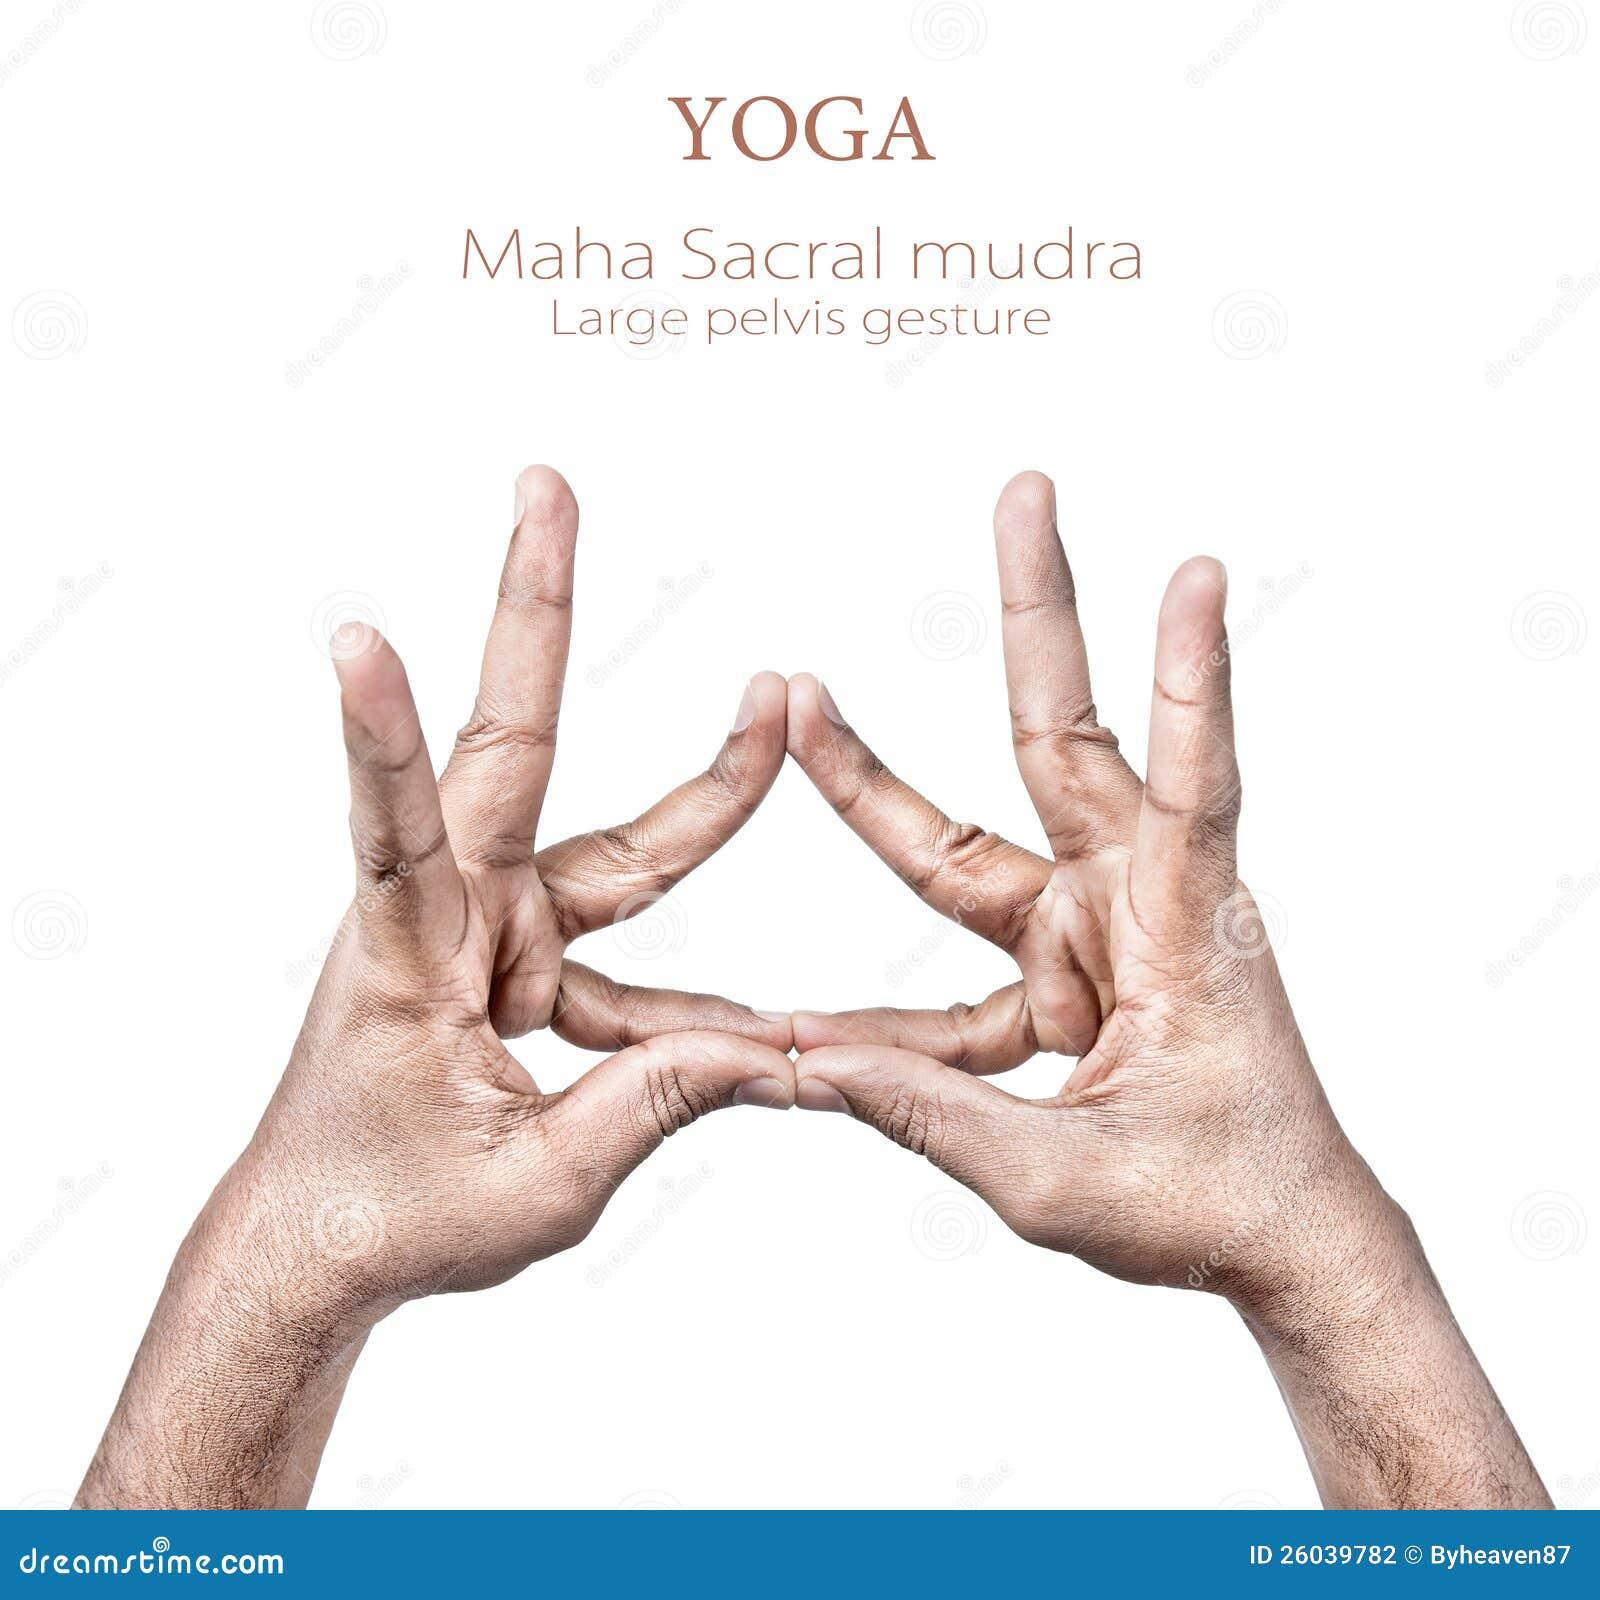 Mudra Hand Gesture Stock Photography - Image: 26039782